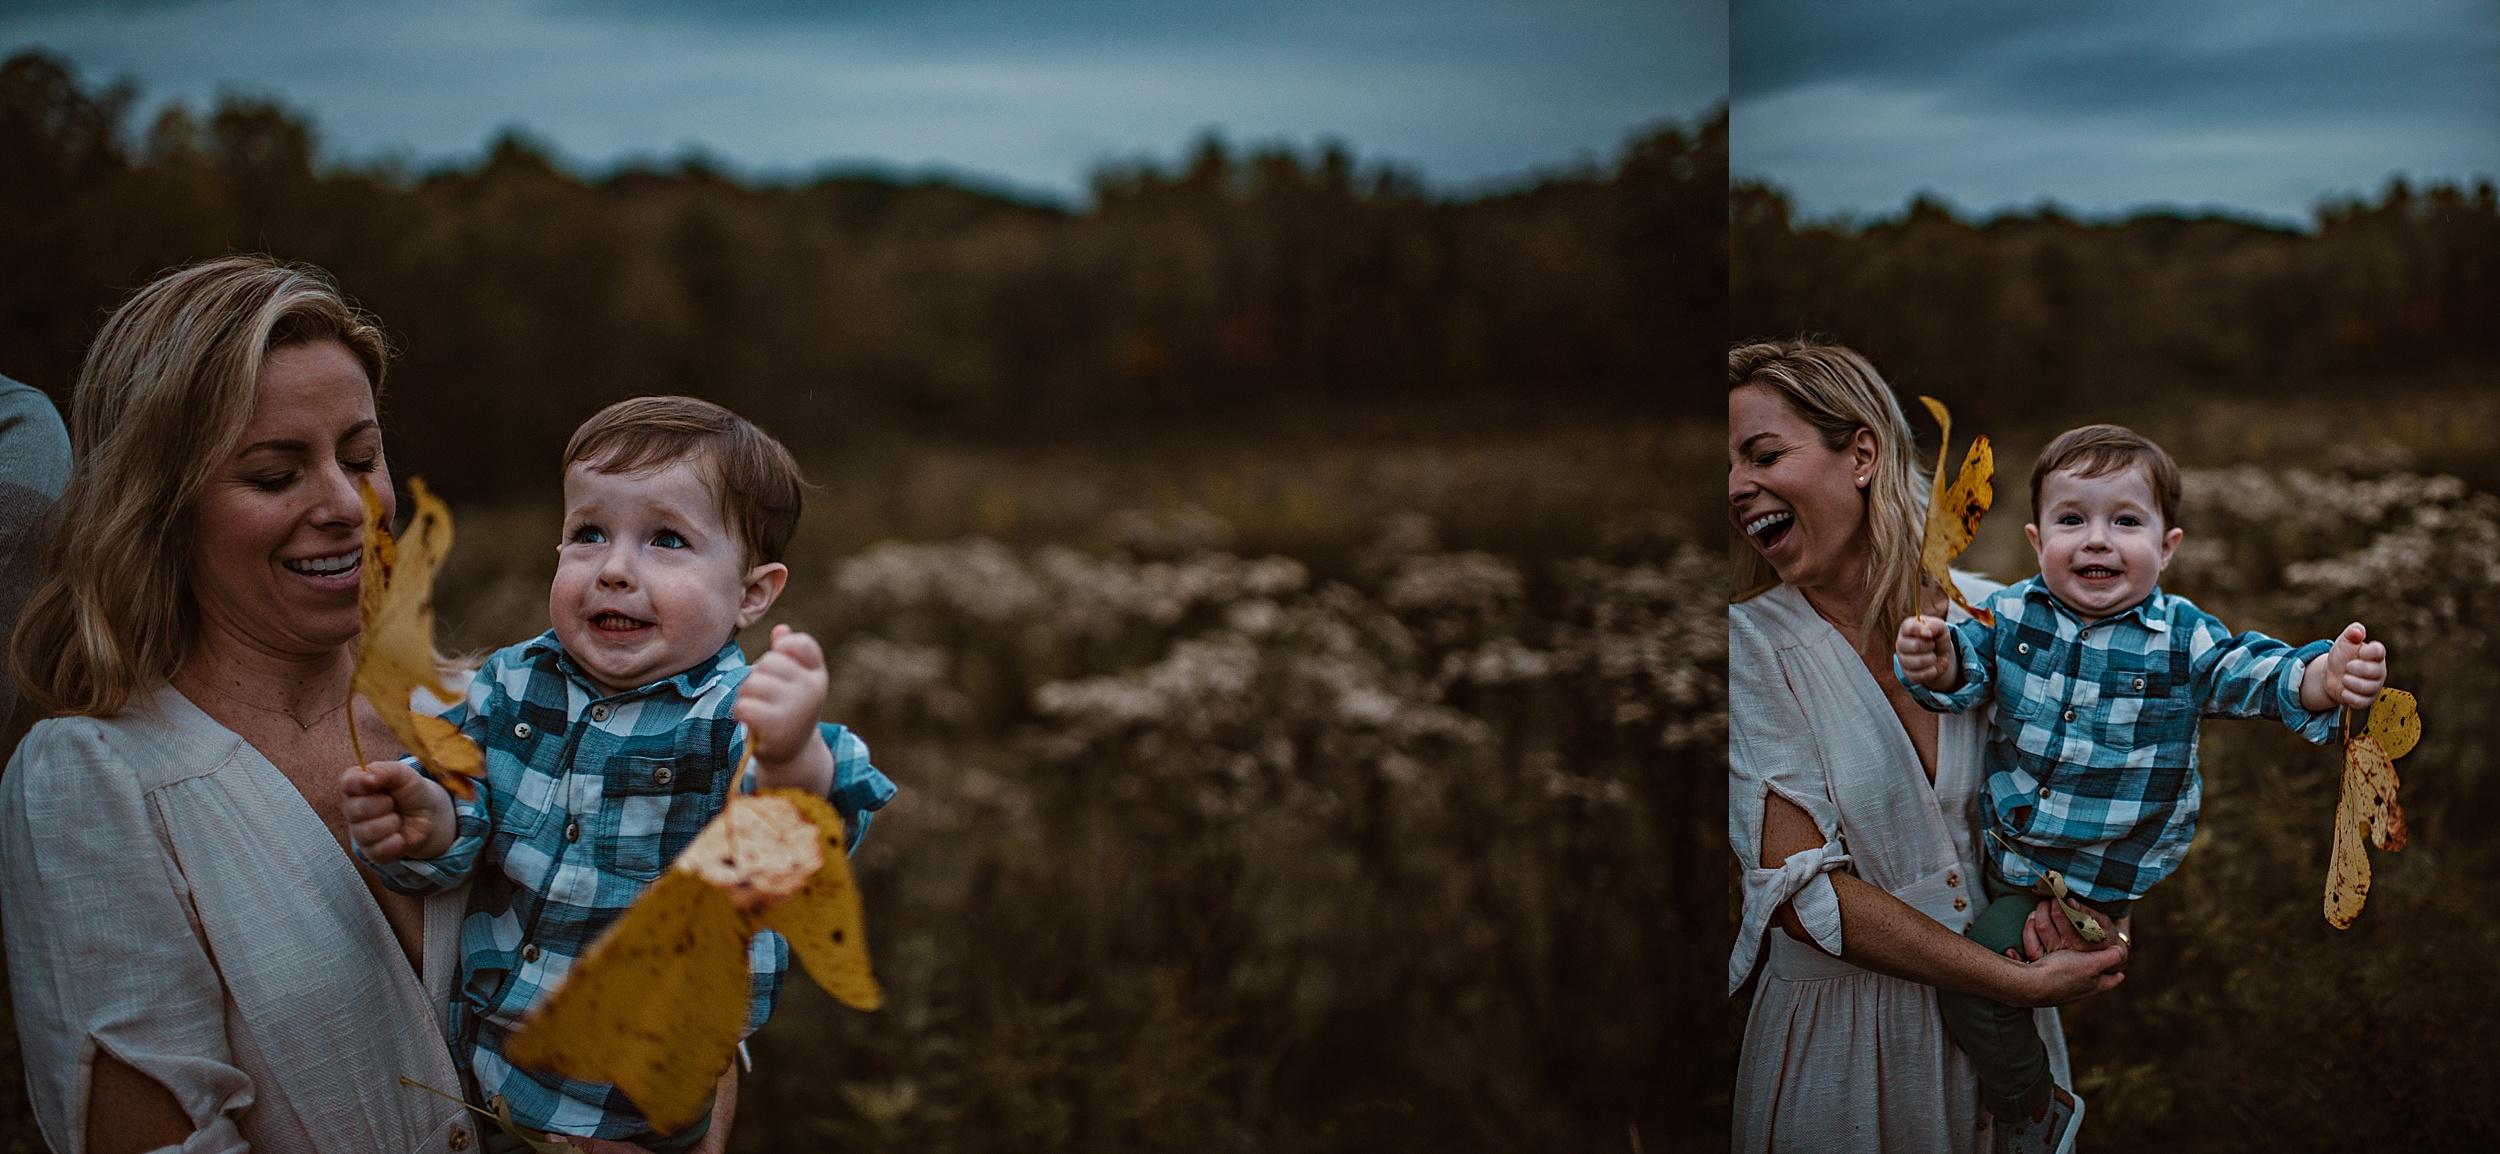 lauren-grayson-photography-portrait-artist-akron-cleveland-ohio-photographer-family-session-fields-sunset-fall_0224.jpg